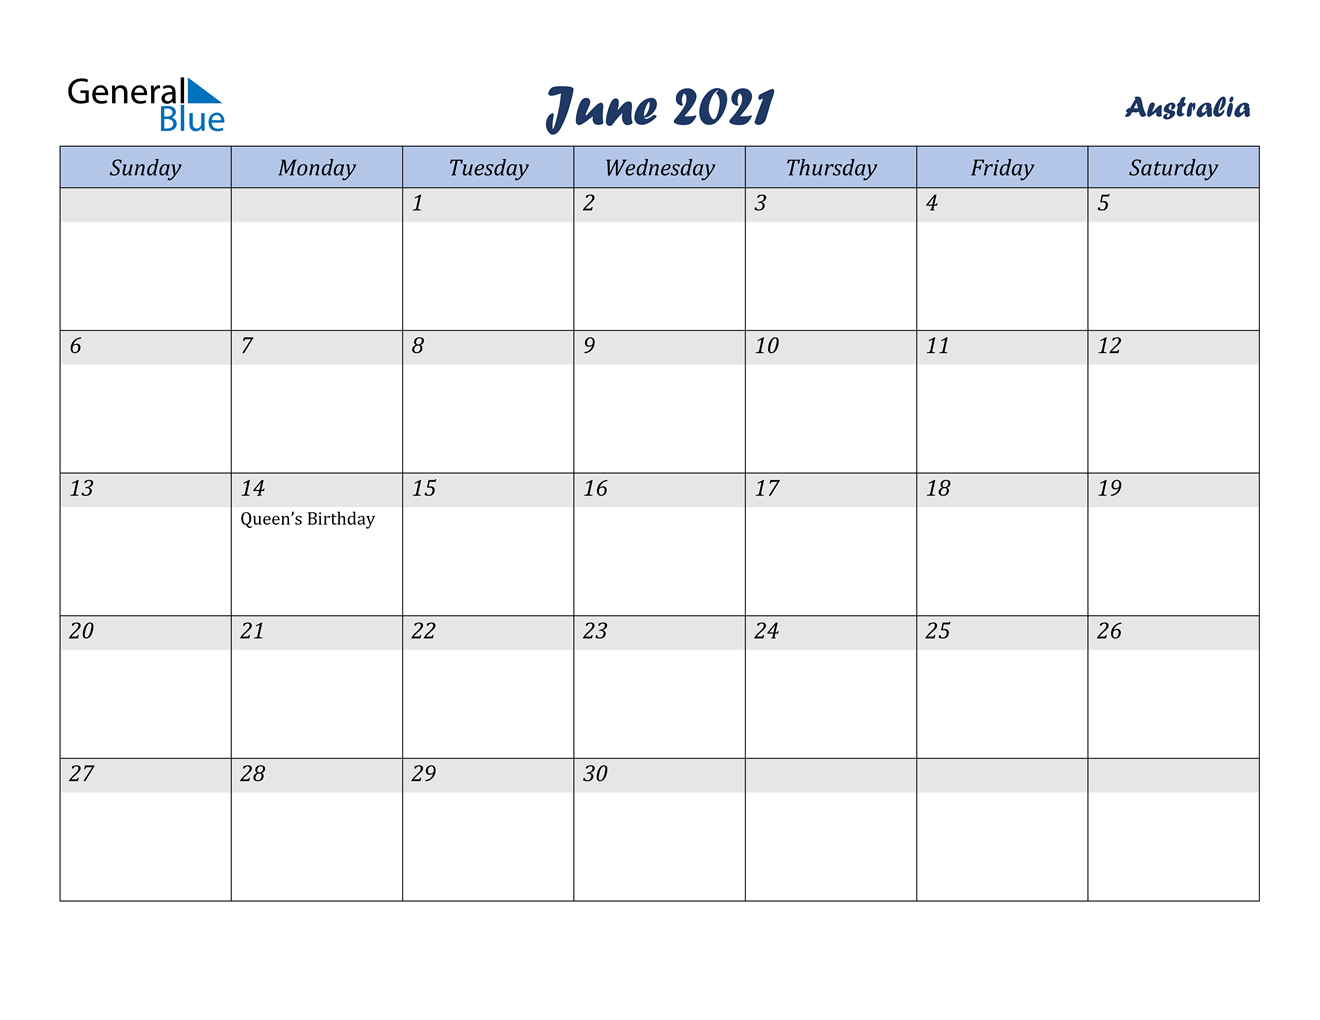 June 2021 Calendar - Australia